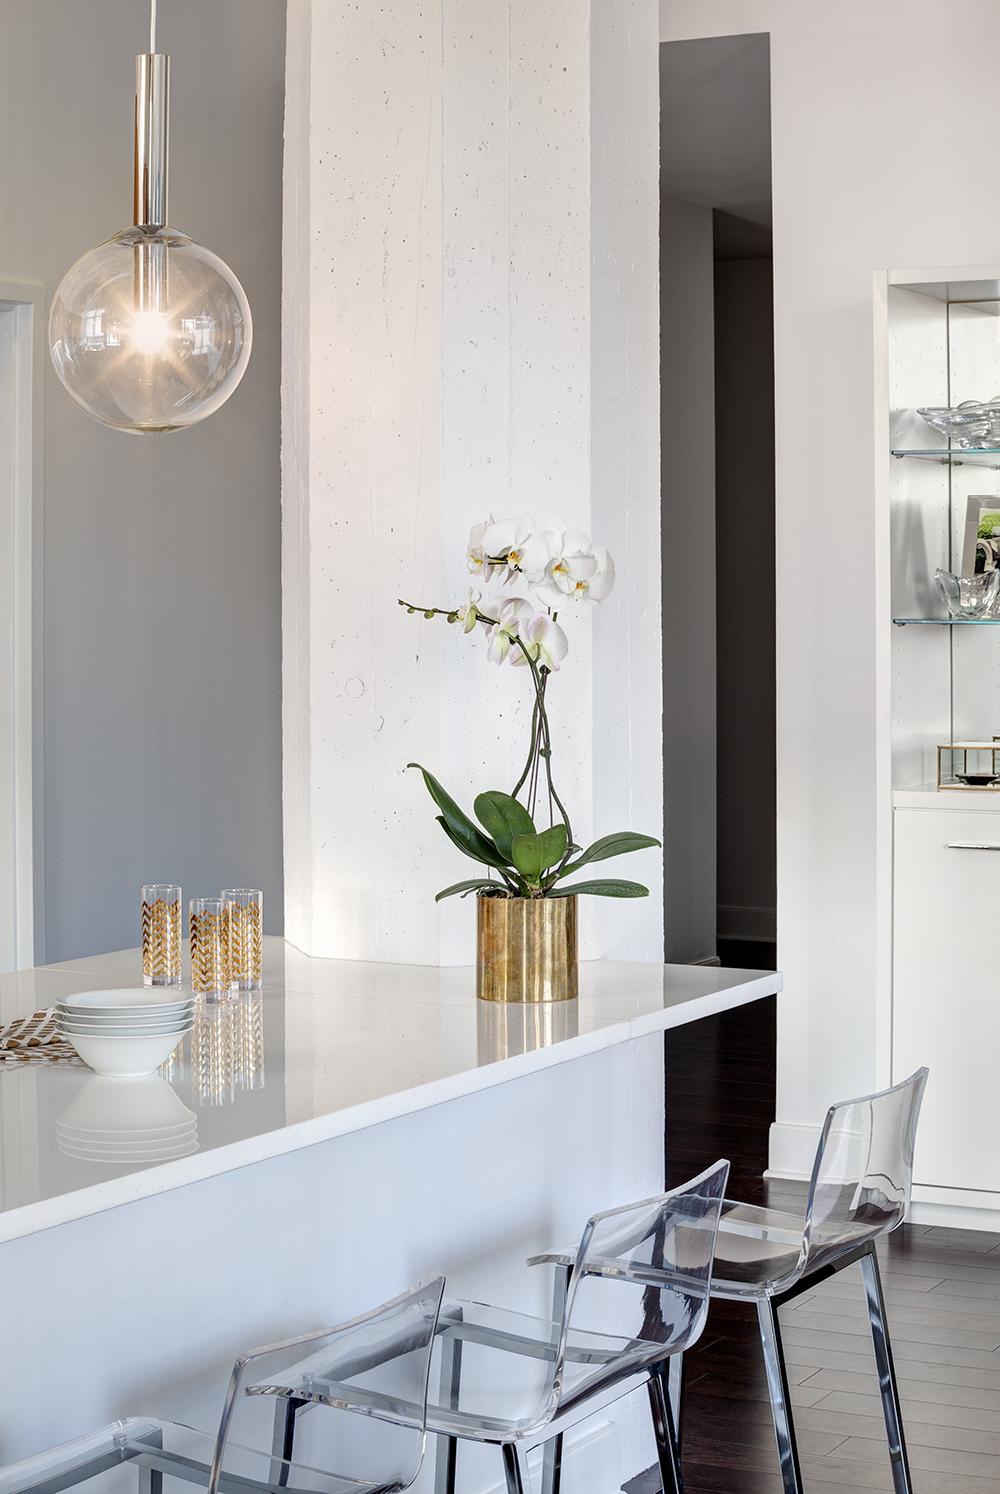 Project: Hoboken Apartment Designer: AE Design Stylist: Brice Gaillard Location: Hoboken, NJ